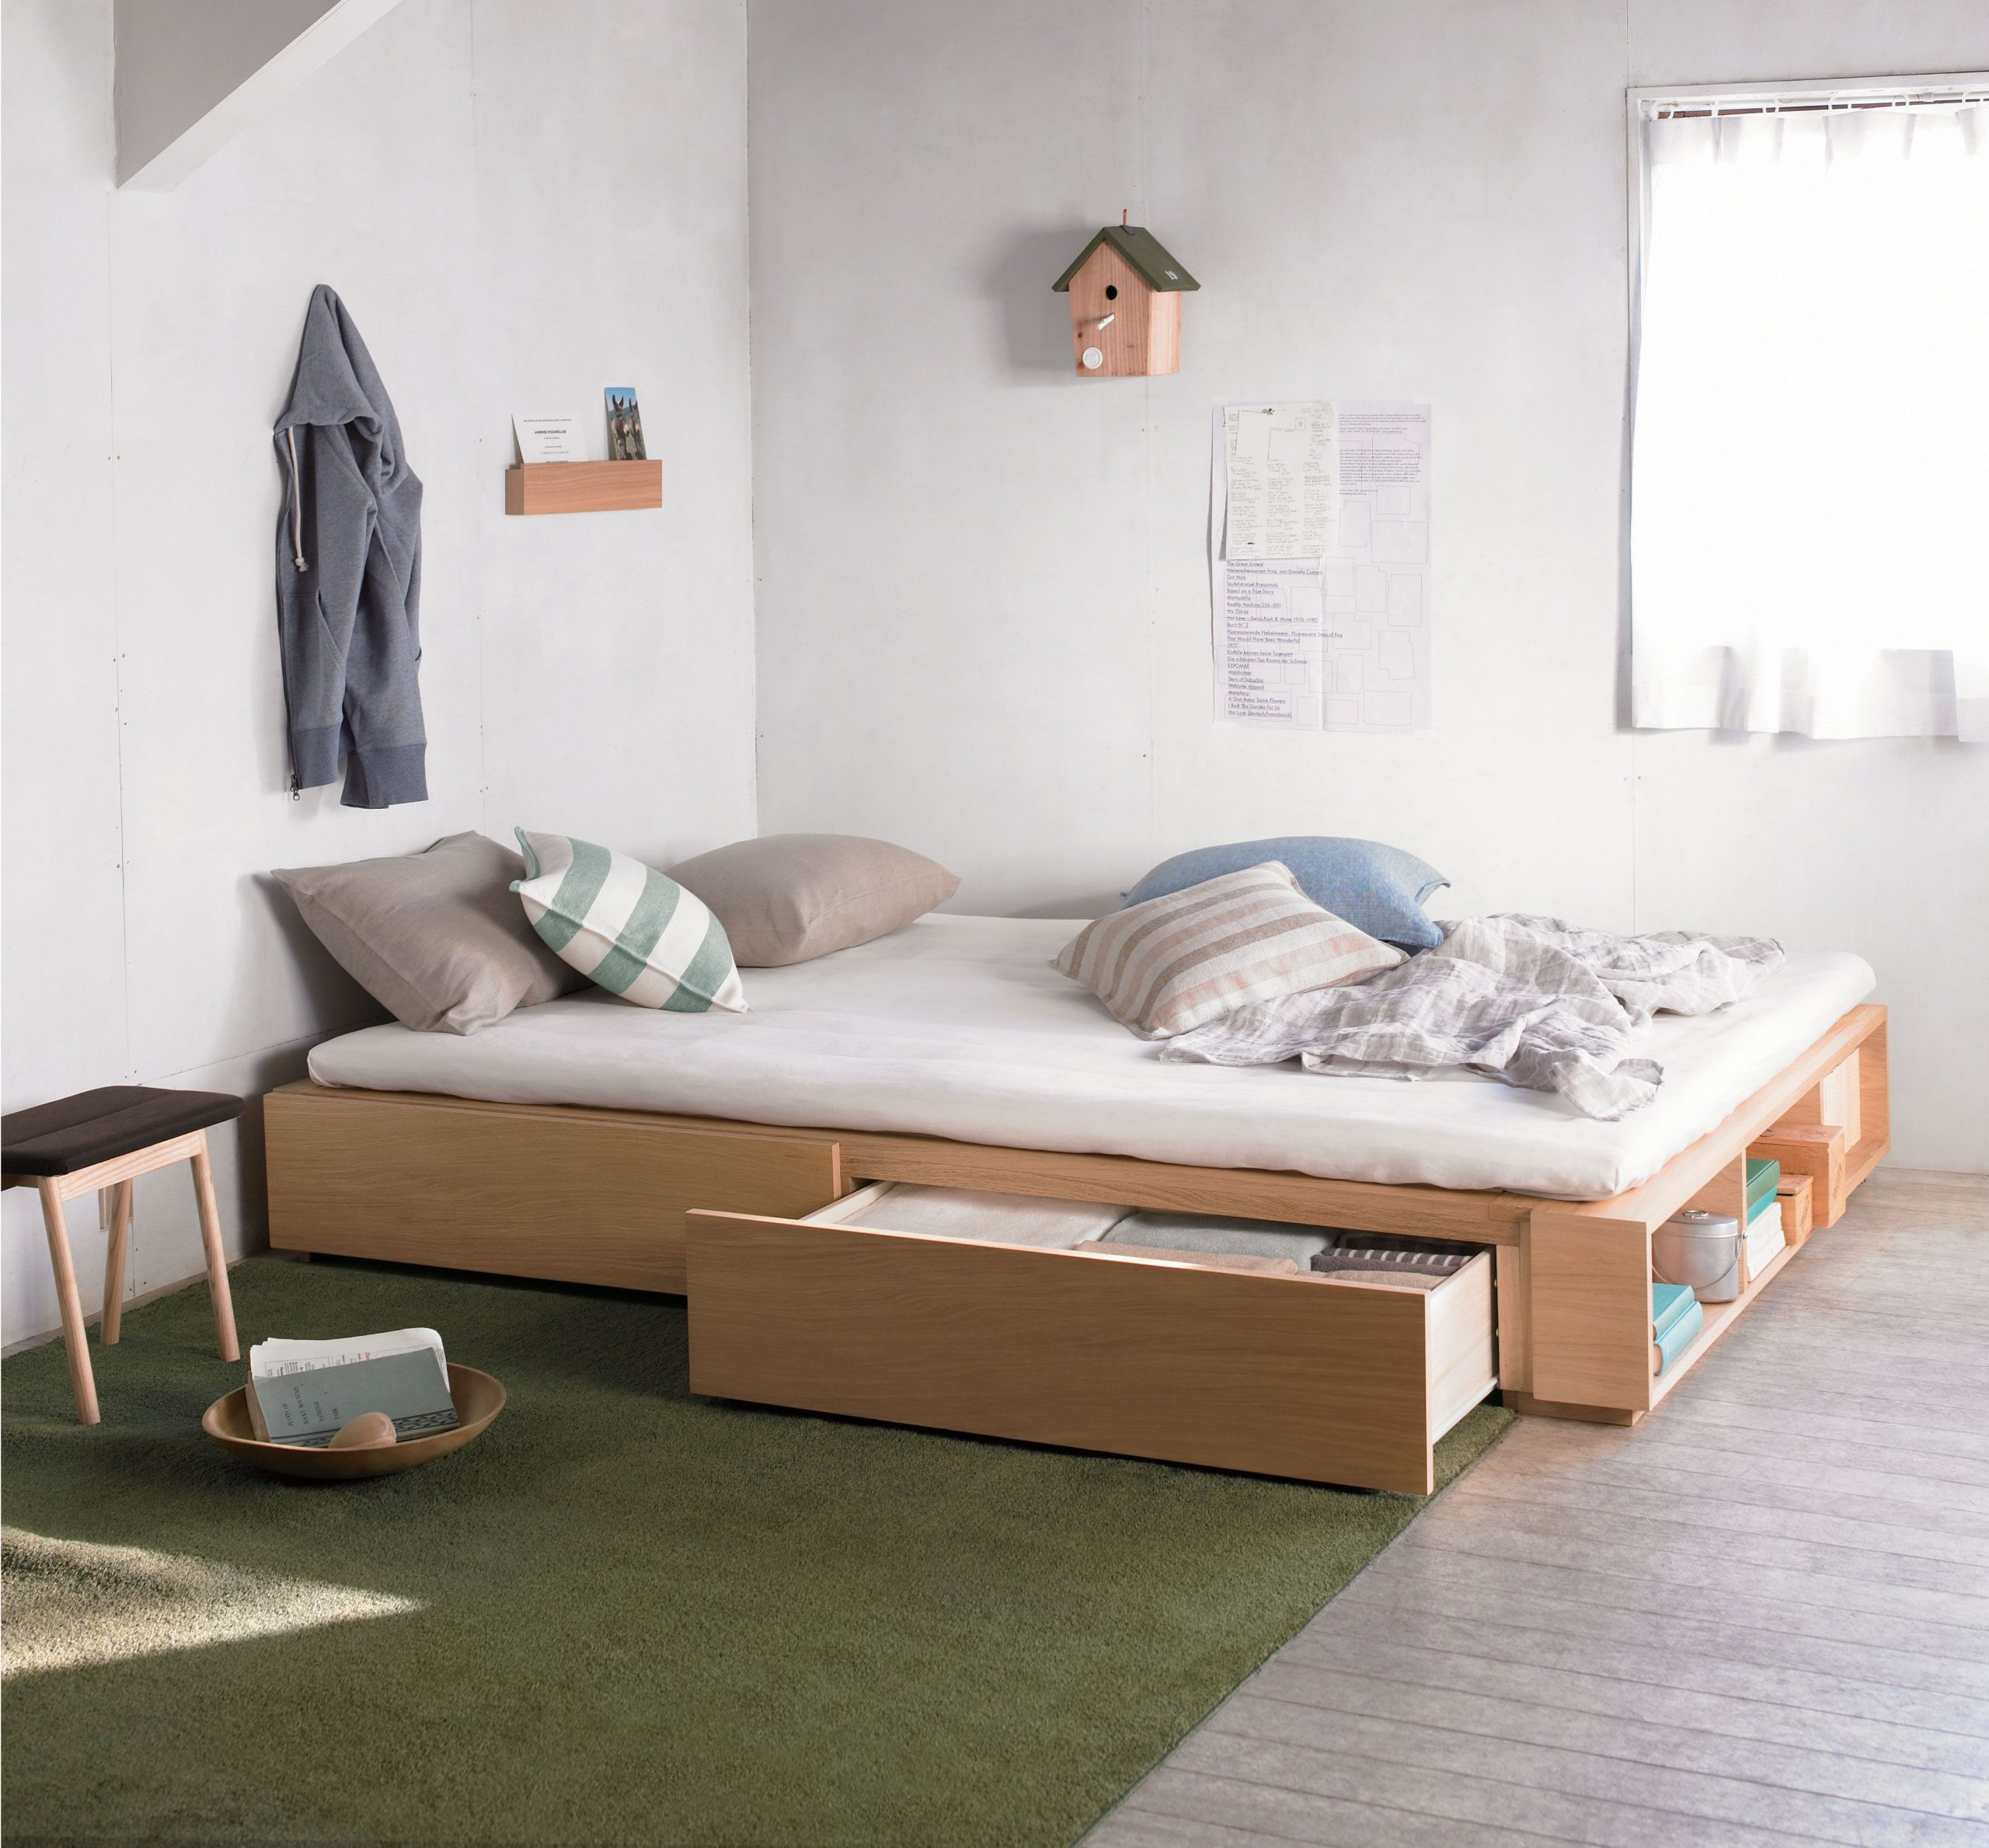 Full Size of Bett Mit Schubladen 160x200 Ikea Malm 140x200 Weiss Betten 200x200 90x200 Schwarz Gebraucht Berlin Schublade 120x200 100x200 Moderne Doppel Stauraum Kapitne Bett Betten Mit Schubladen